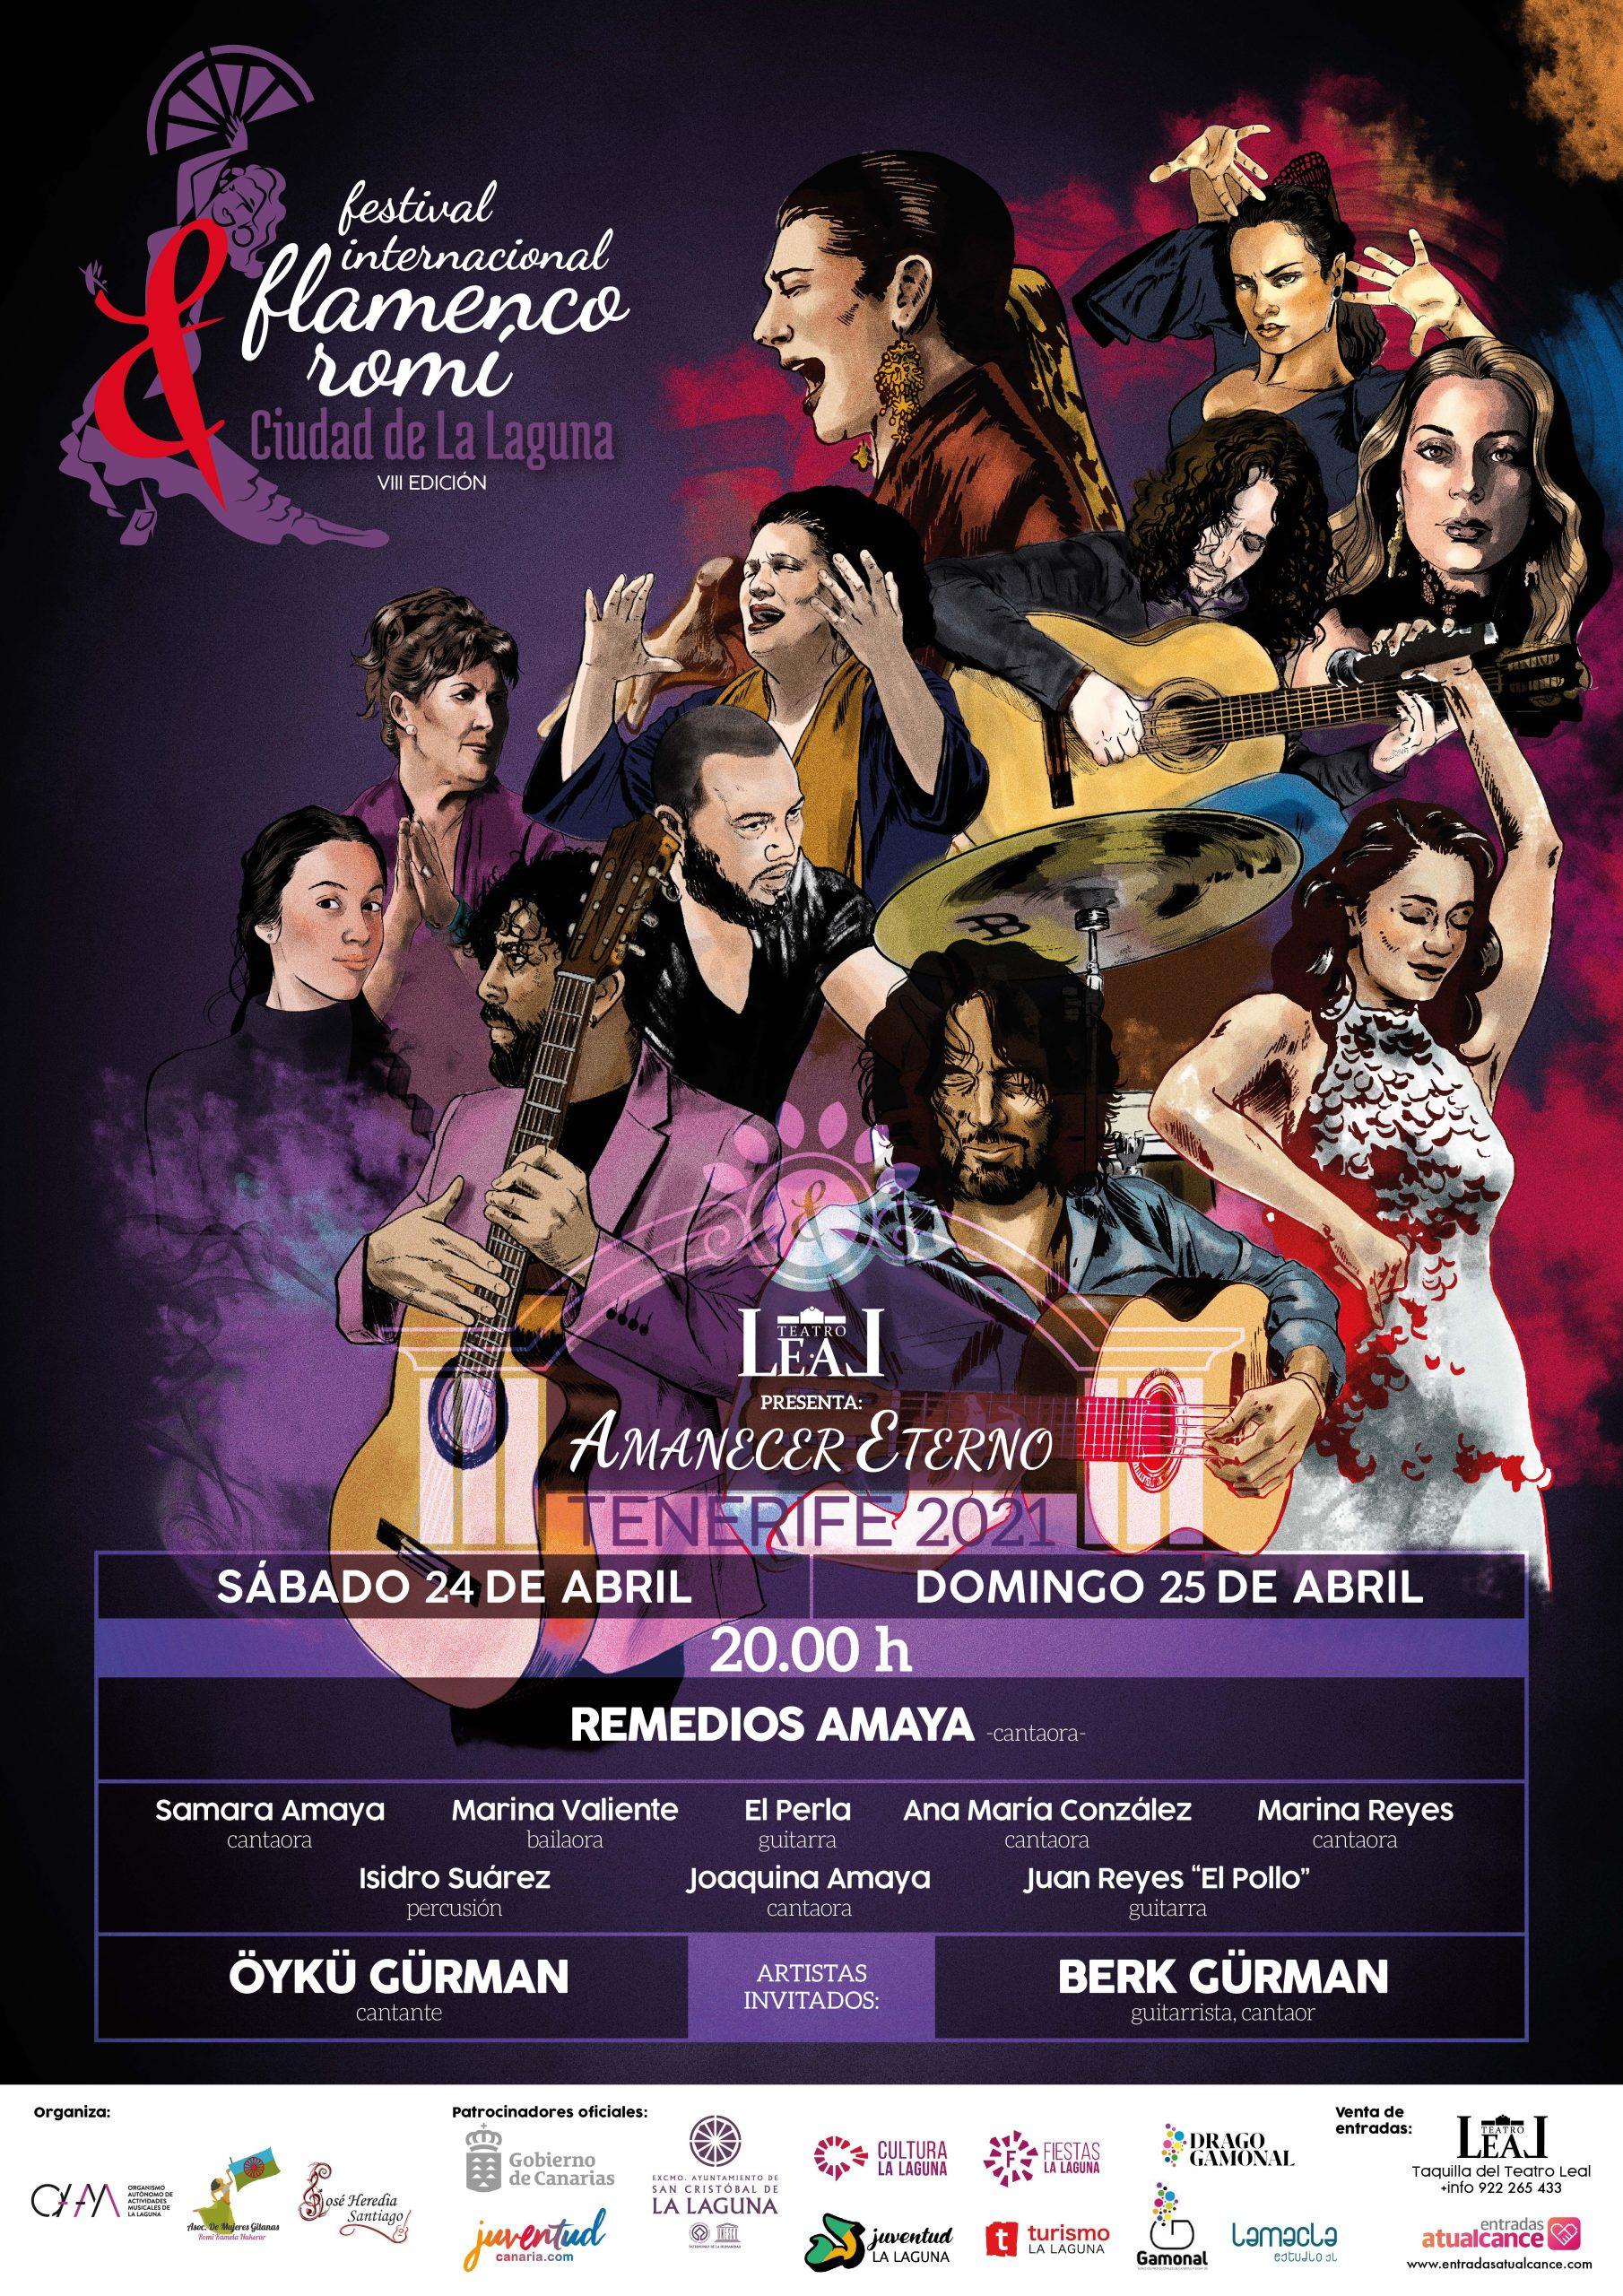 Festival Internacional Flamenco Romì Ciudad de la Laguna